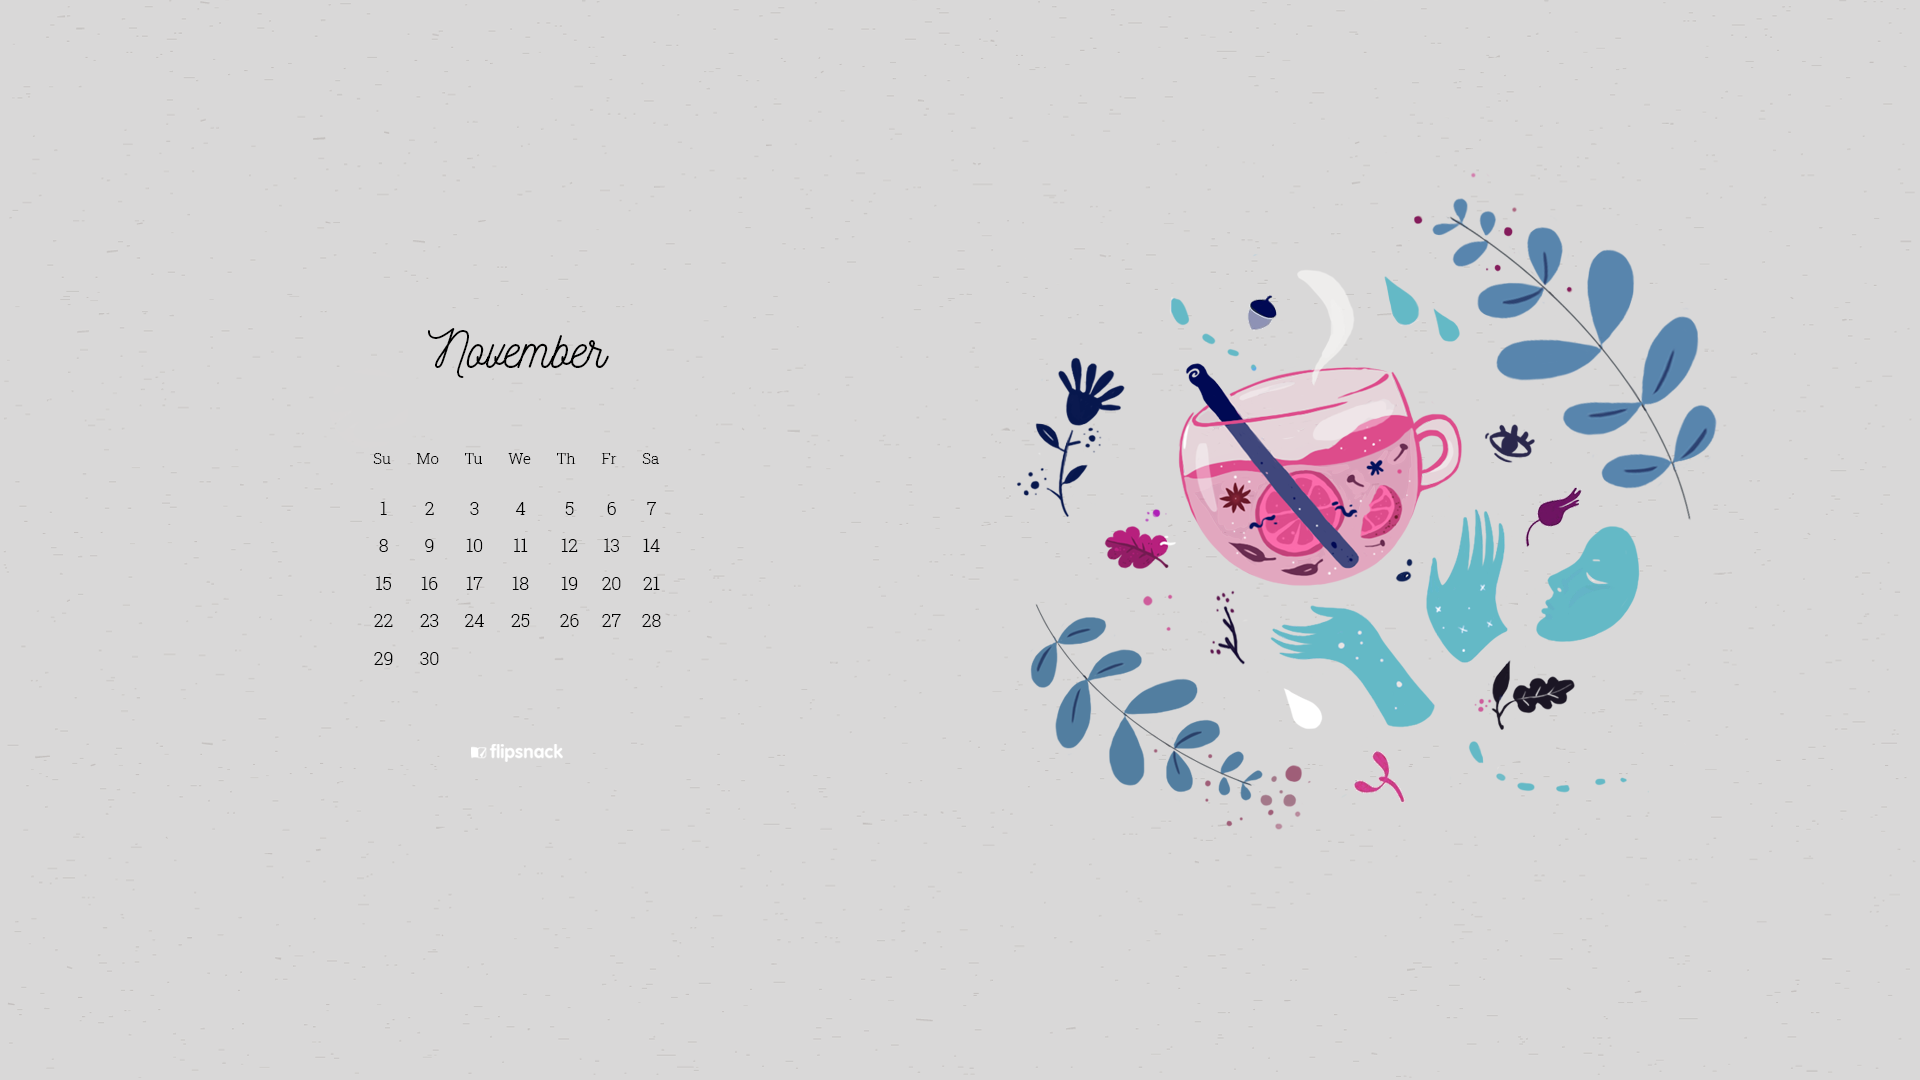 November wallpaper calendars